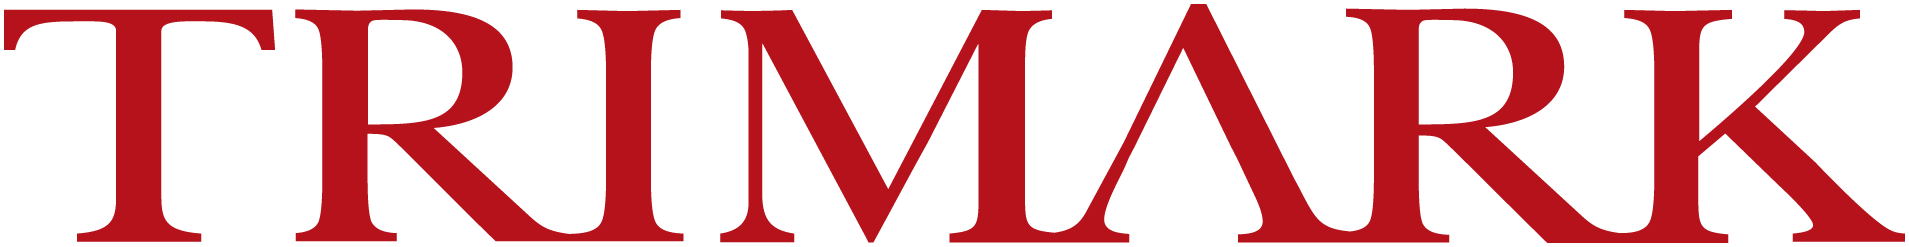 trimark-sportswear-logo.png